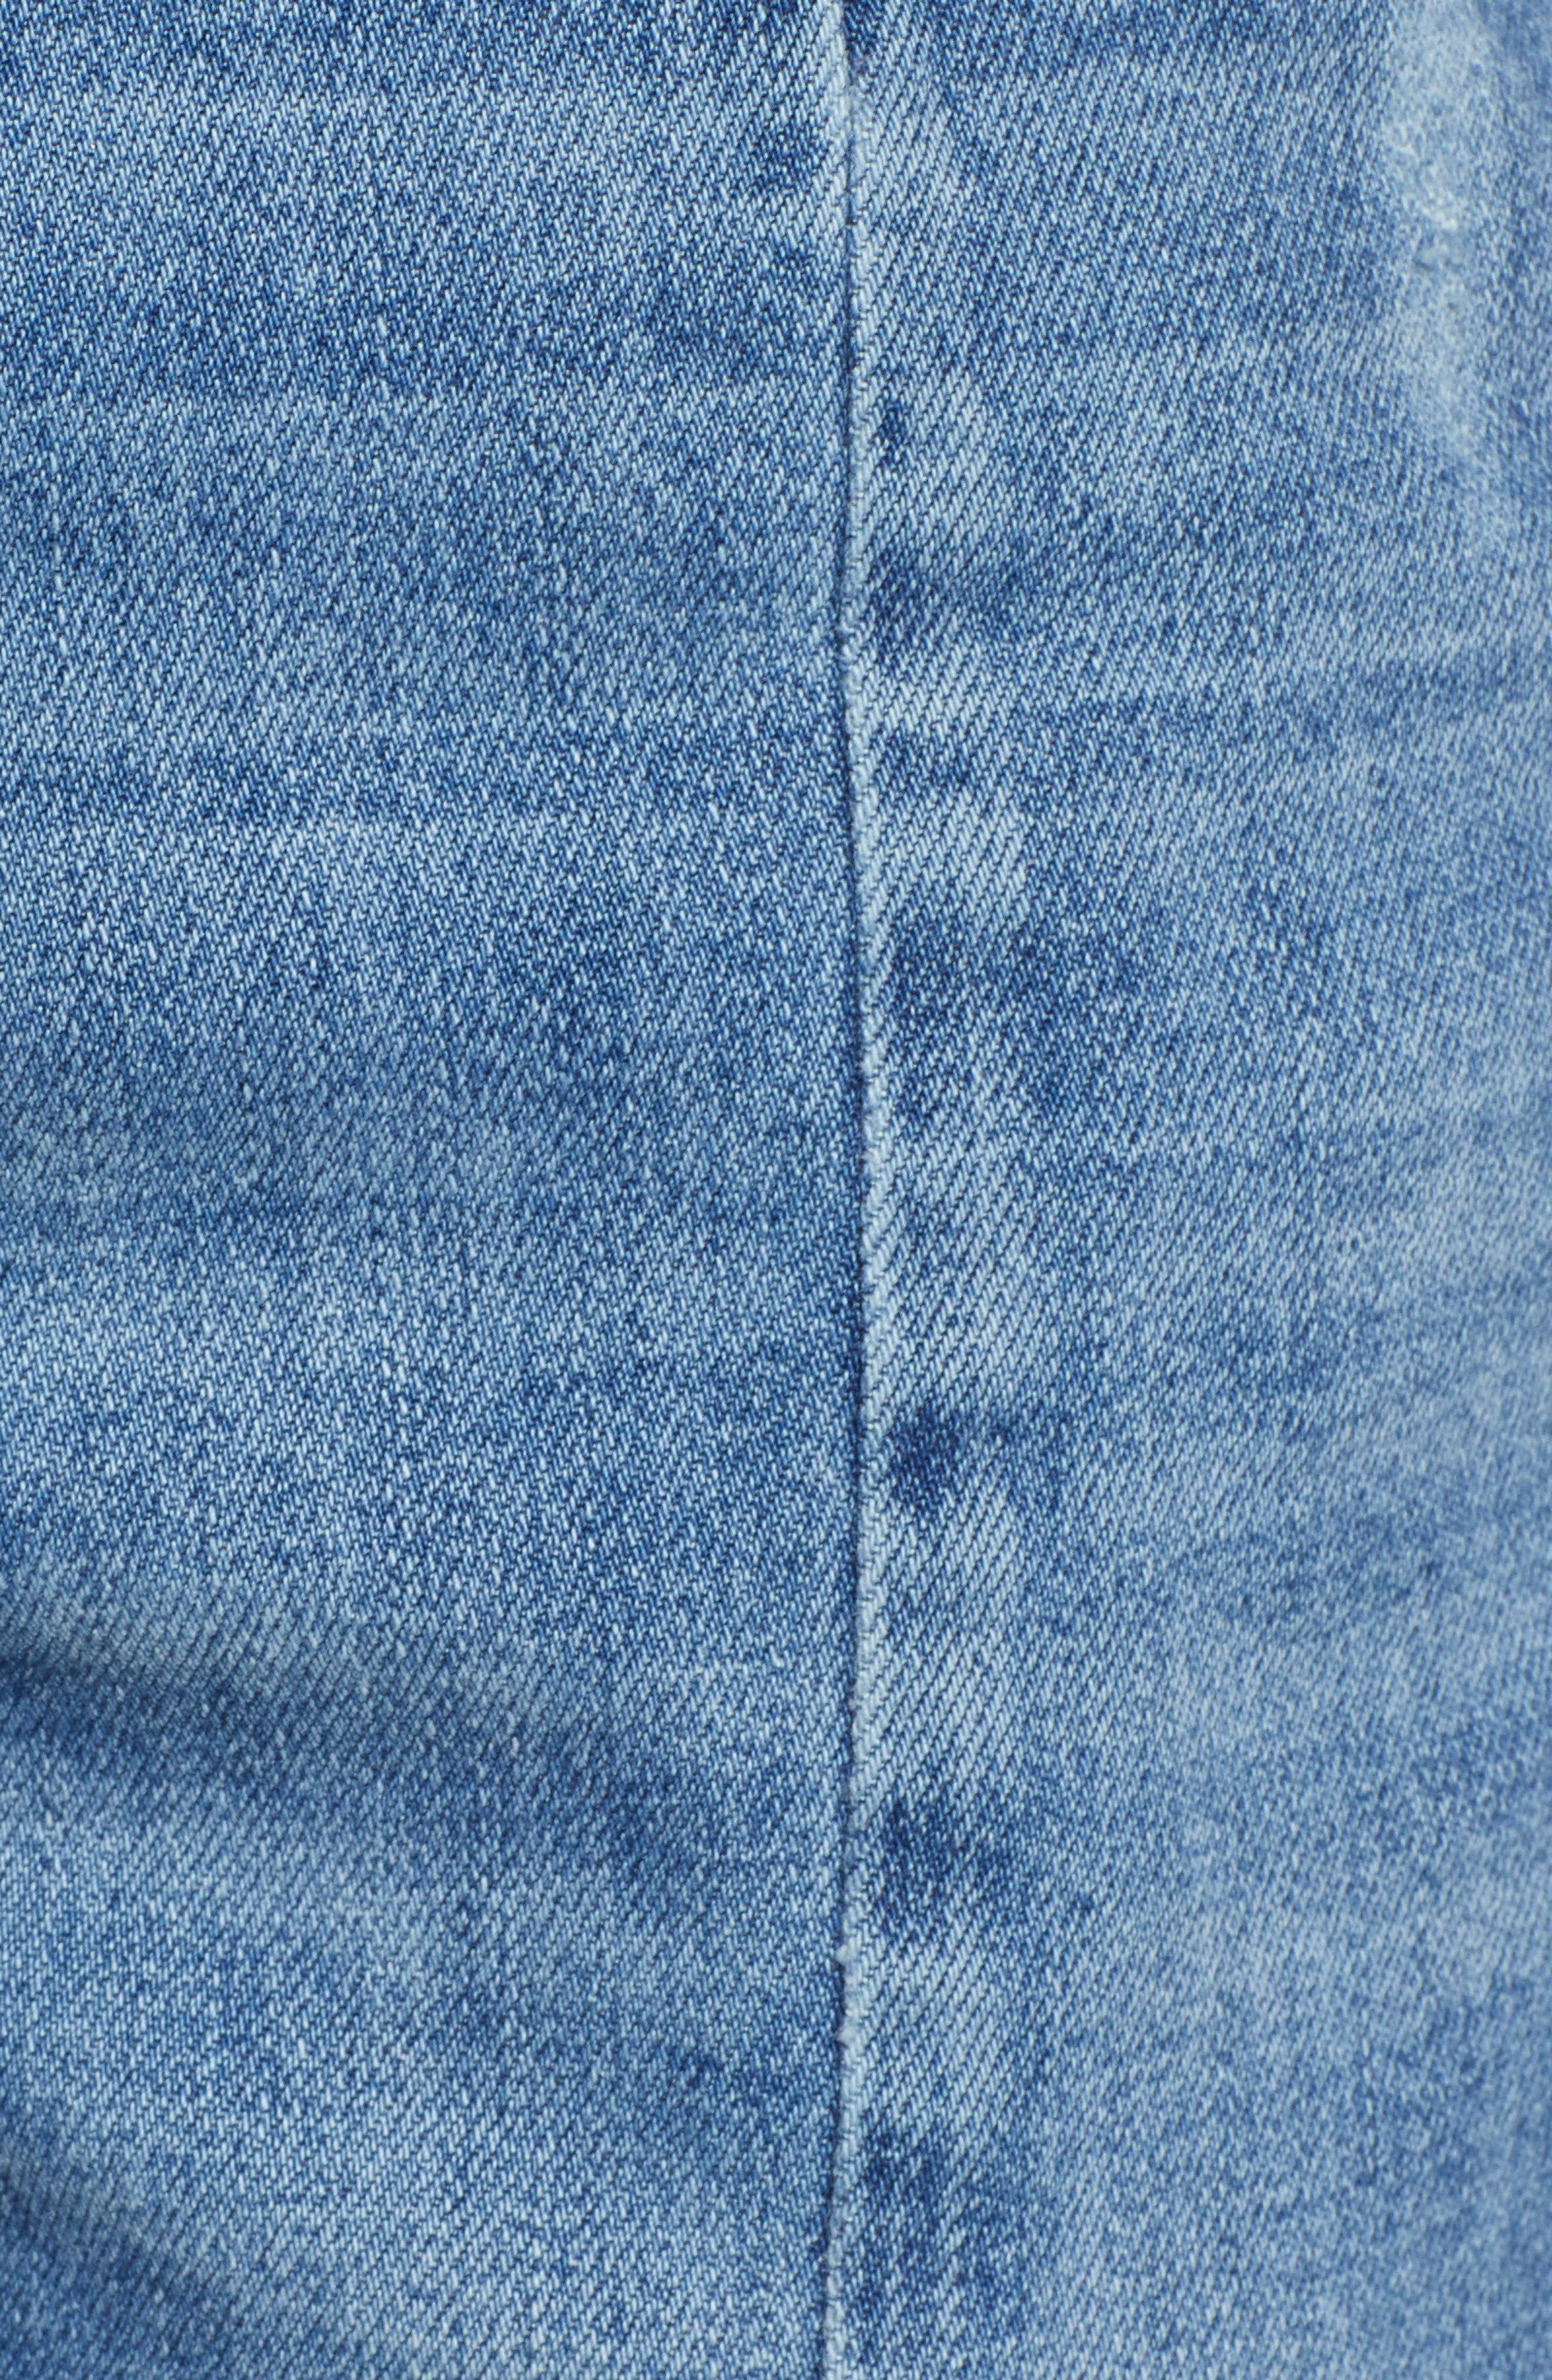 High Waist Ankle Slit Skinny Jeans,                             Alternate thumbnail 6, color,                             429